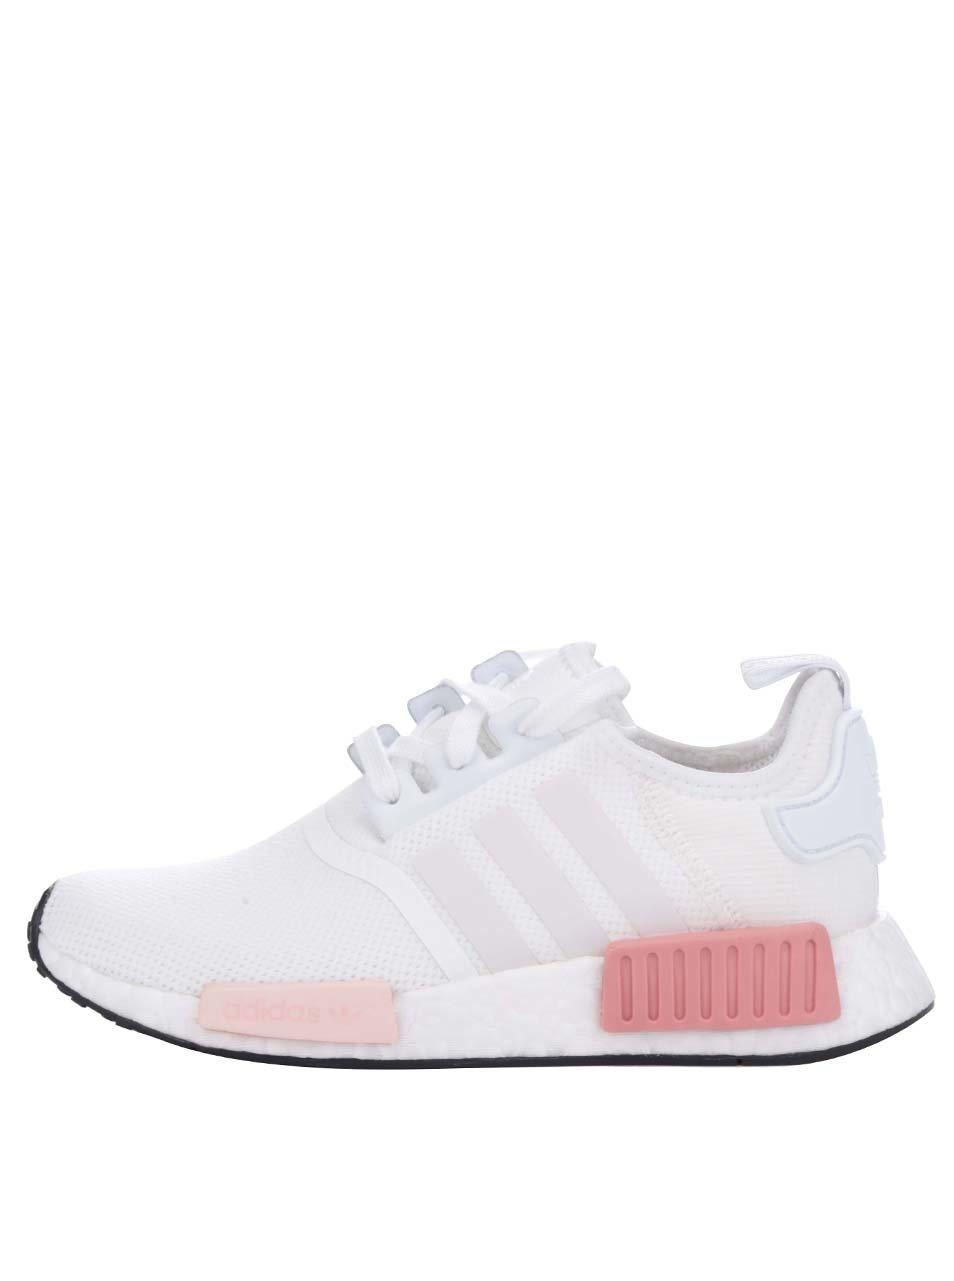 Biele dámske tenisky adidas Originals Nmd ... b2c7ae30002